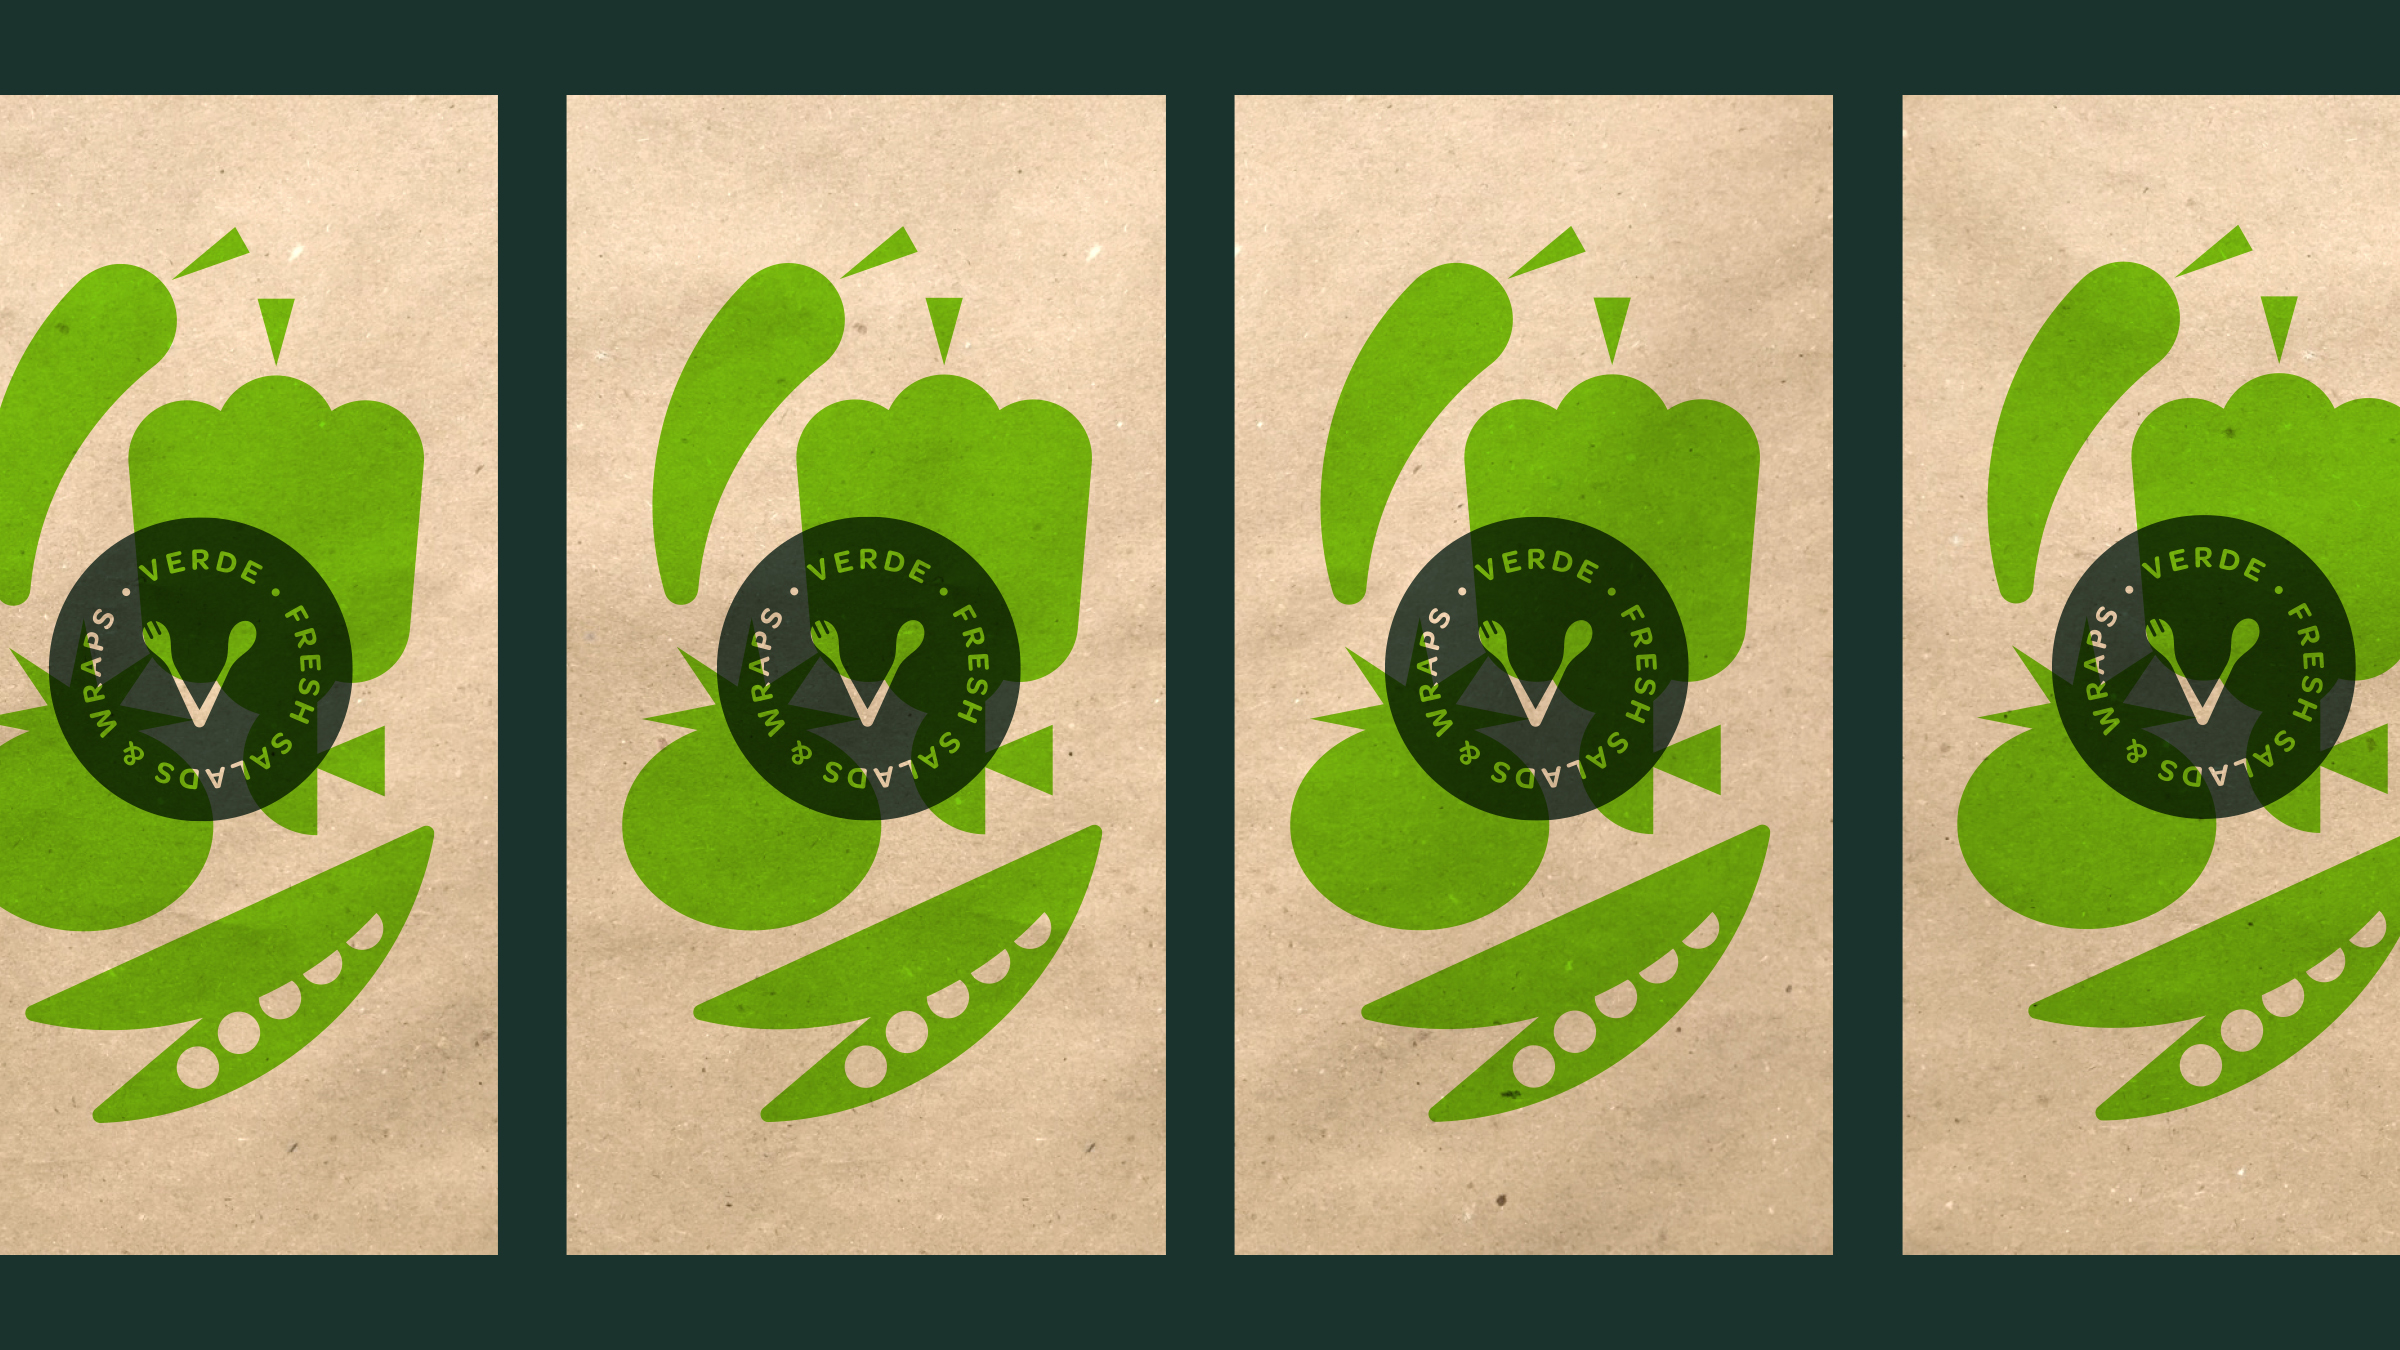 Verde Salad Restaurant Smaller Bags